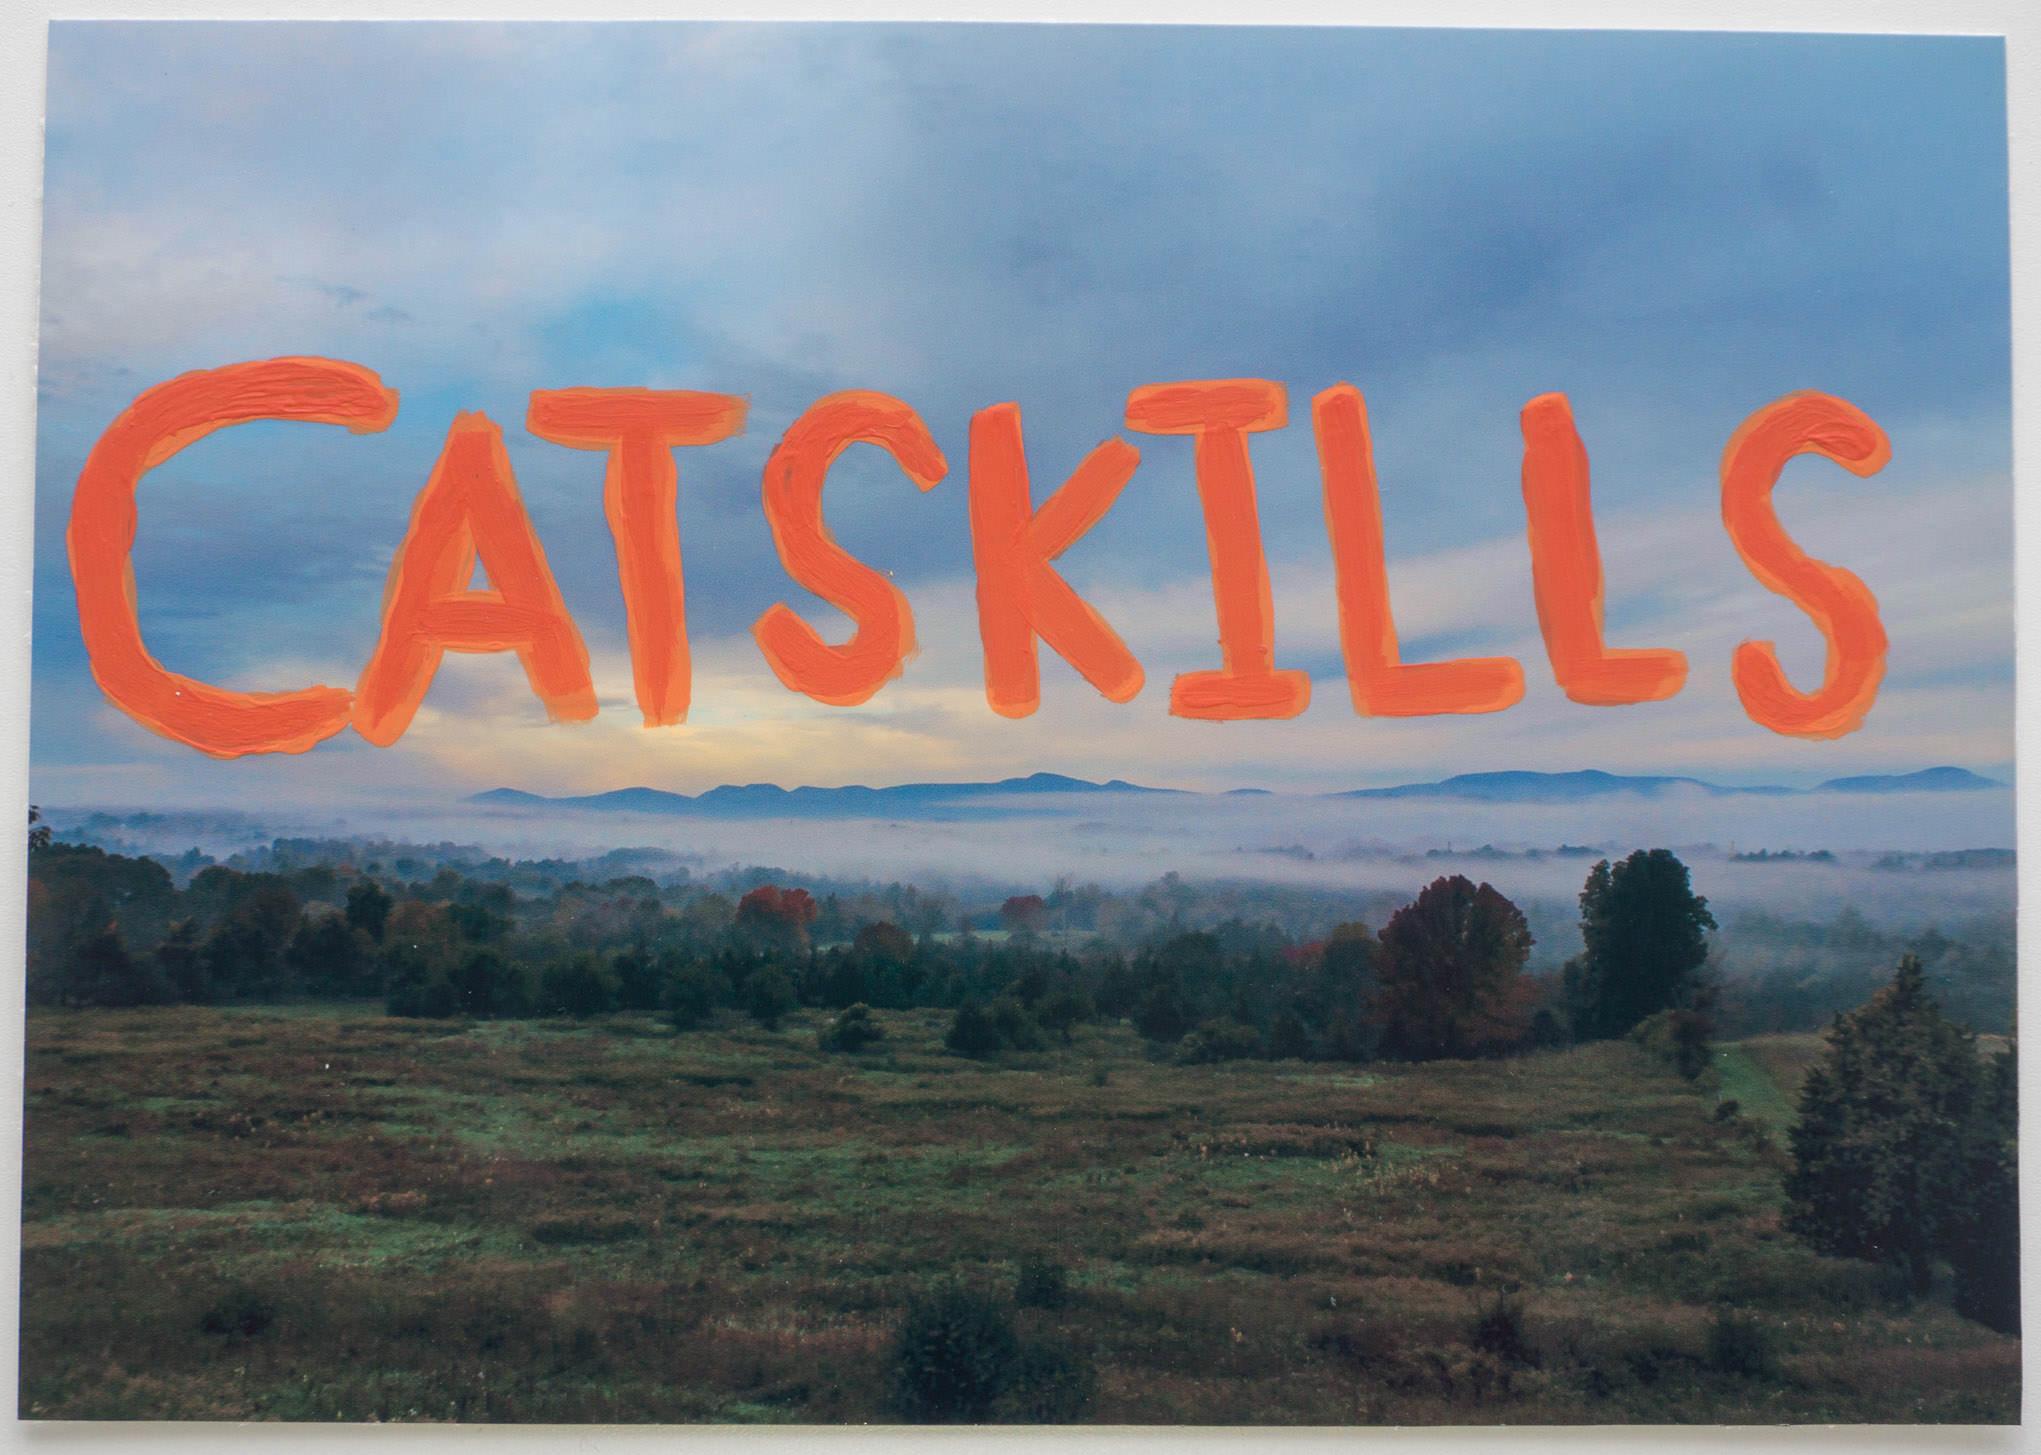 CATSKILLS   (9x6 - print - acrylic